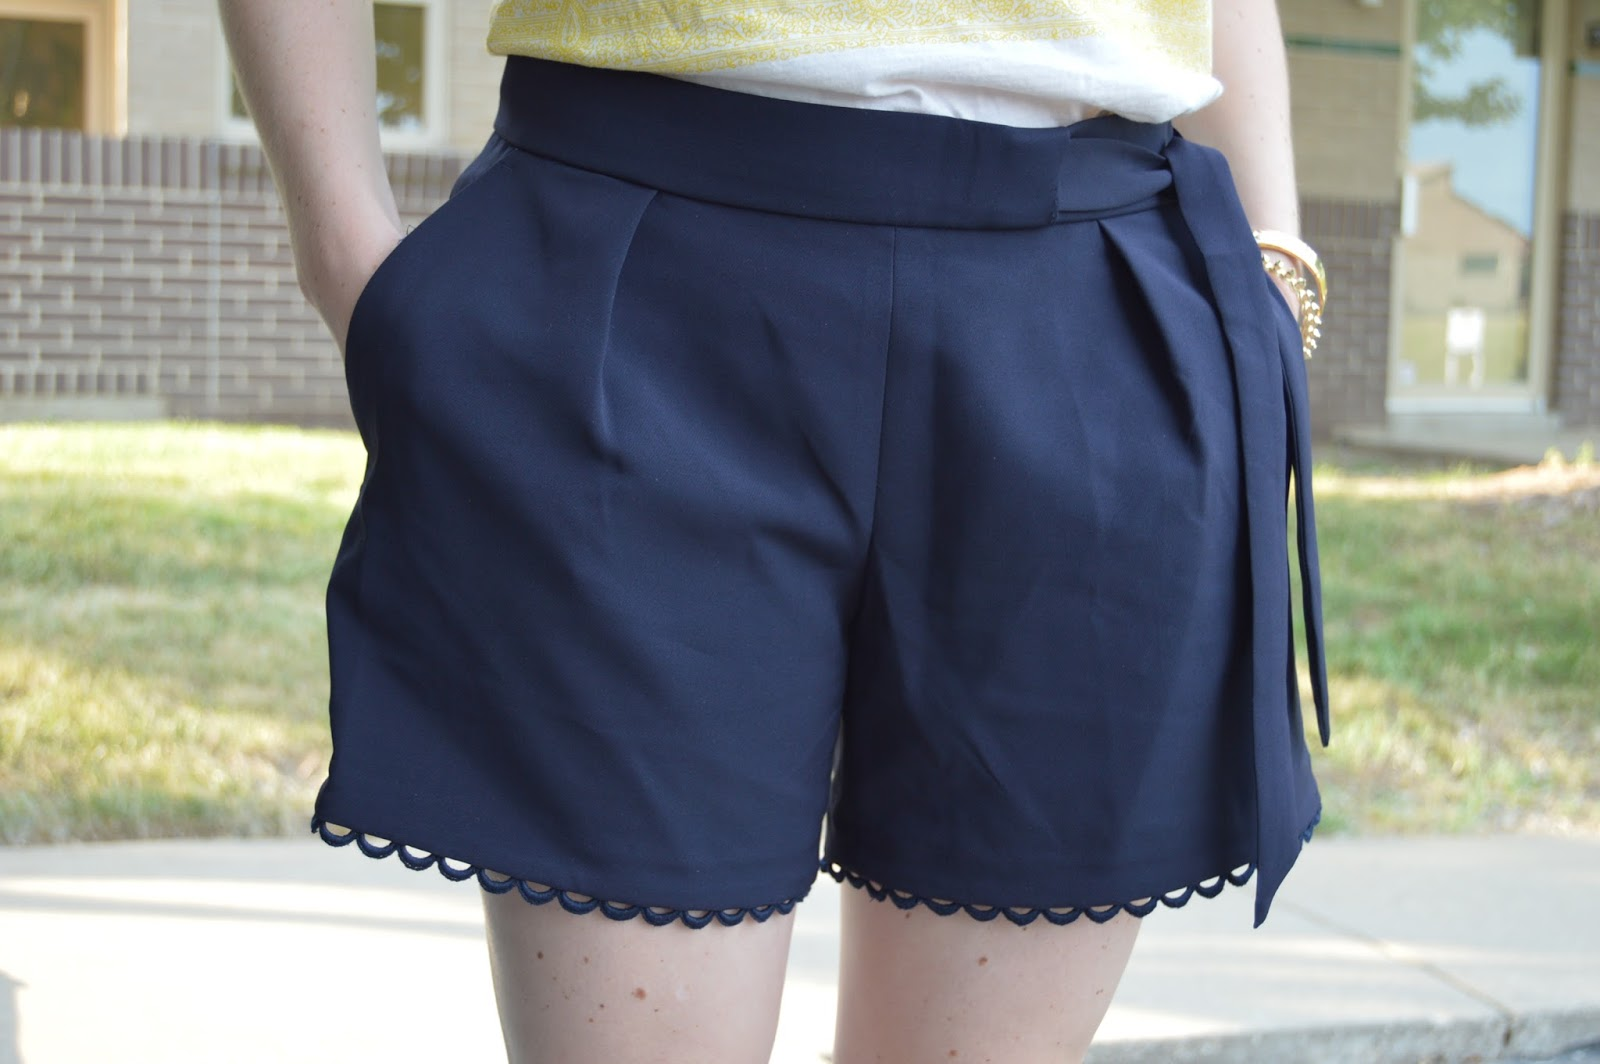 navy lace trim sorts | your life styled  | a memory of us | kansas city fashion blog | banana republic shorts | classy navy shorts | date night shorts |